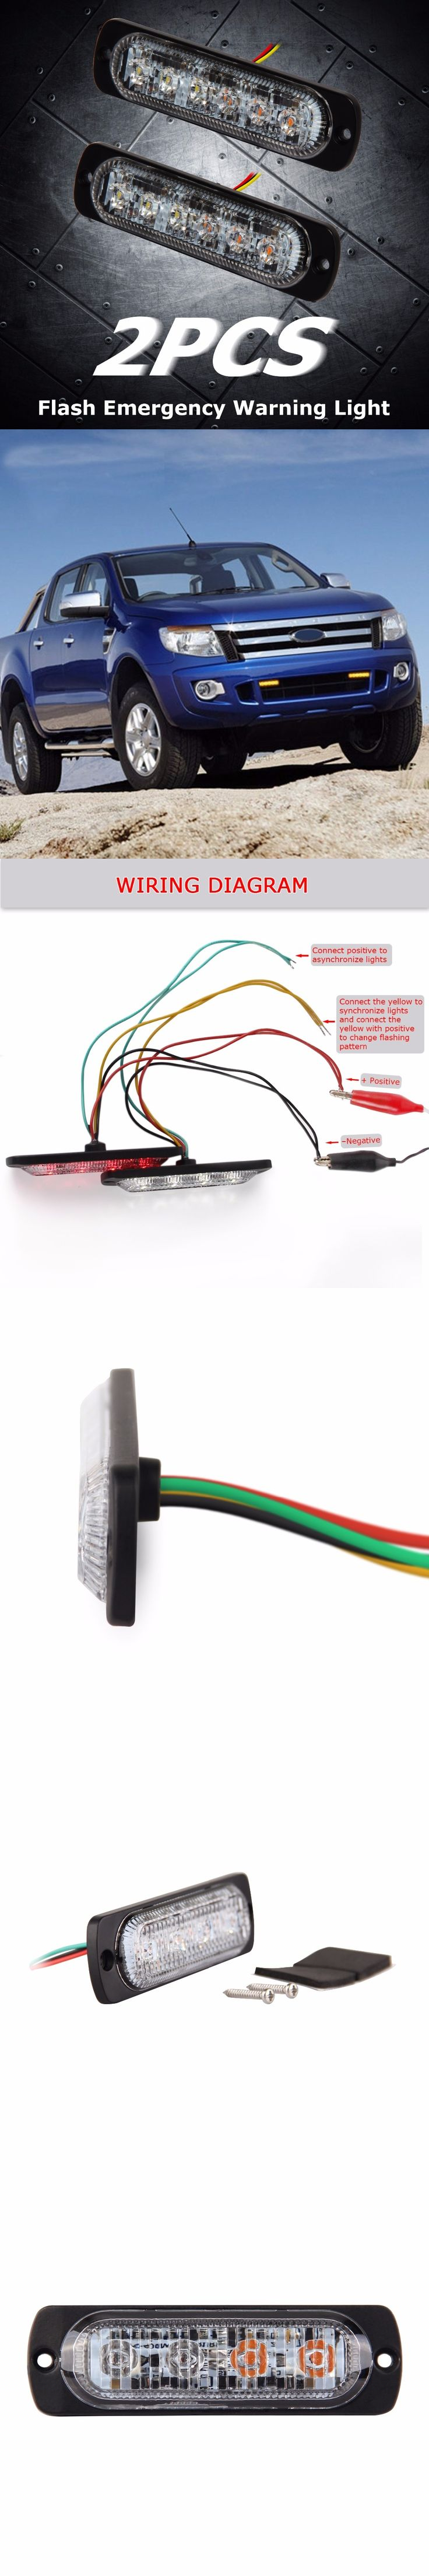 2PC Super Bright Red&Amber 4-LED Car Truck Van Side Strobe Light Warning Flasher Emergency 19 Flash Modes by FOXSTAR